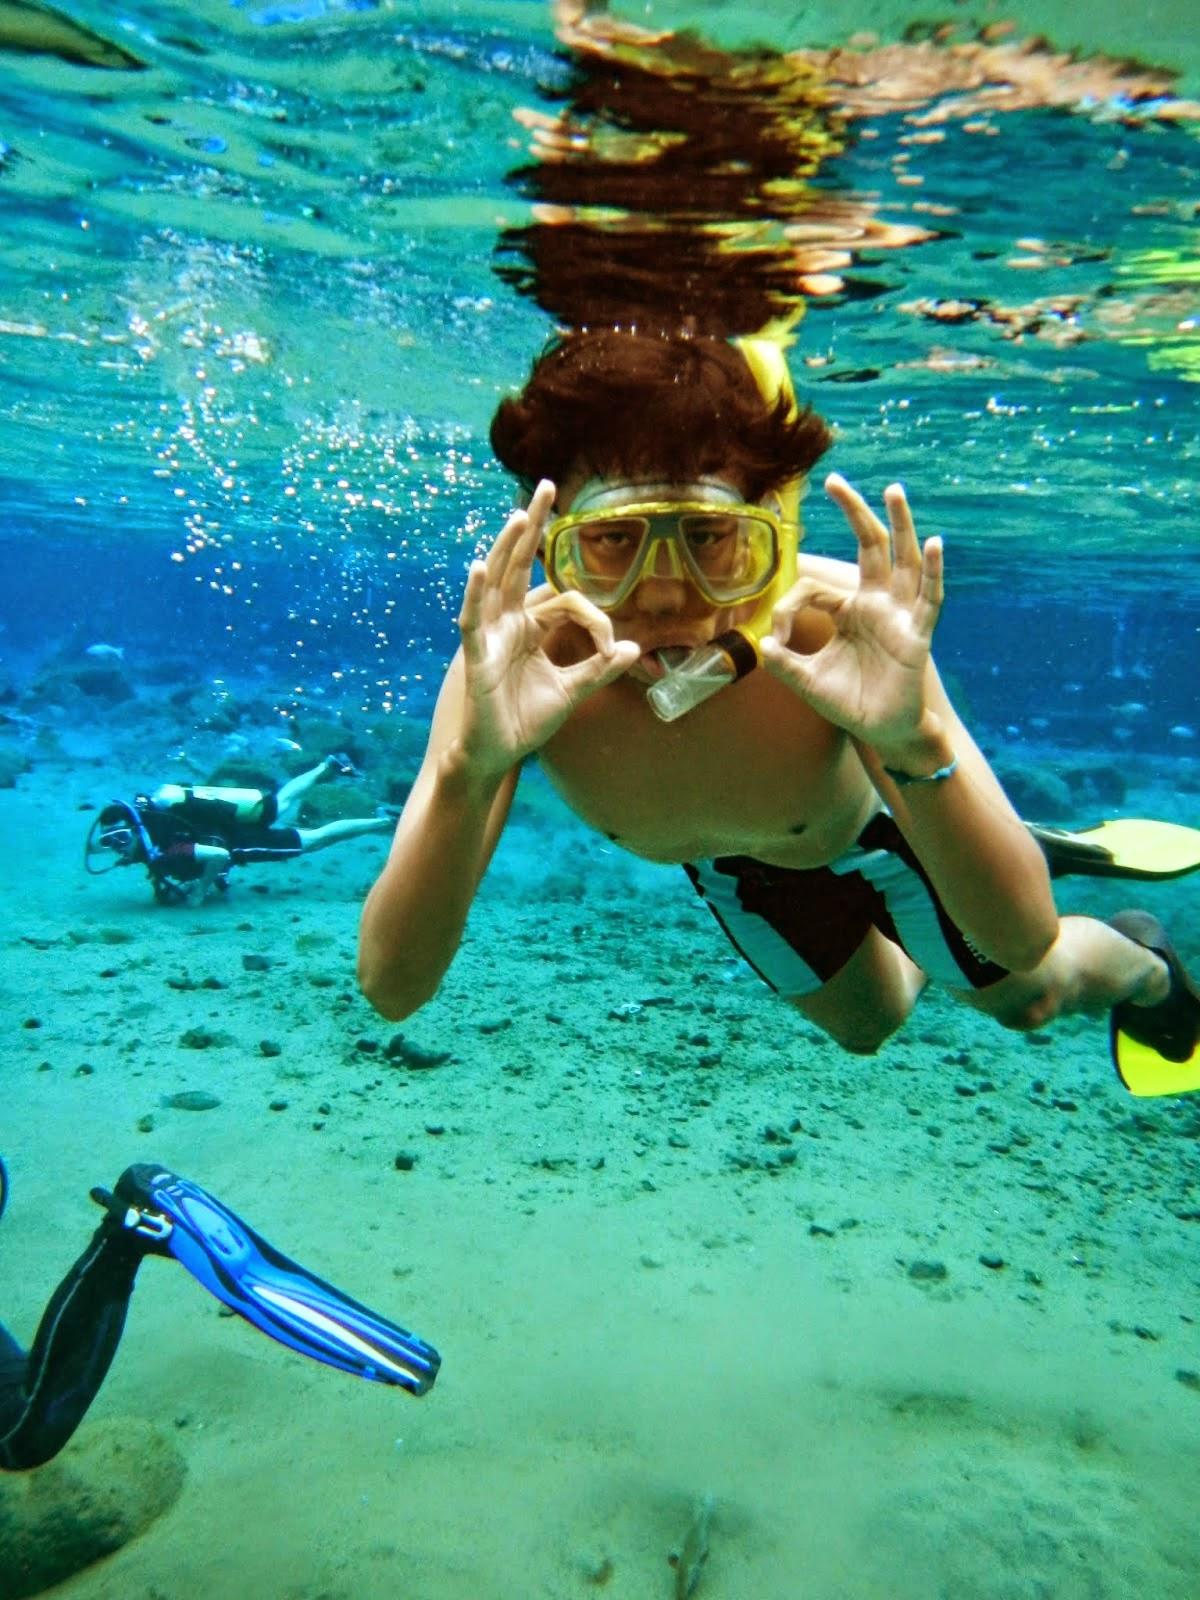 Ayo Snorkeling ke Wisata Umbul Ponggok Klaten